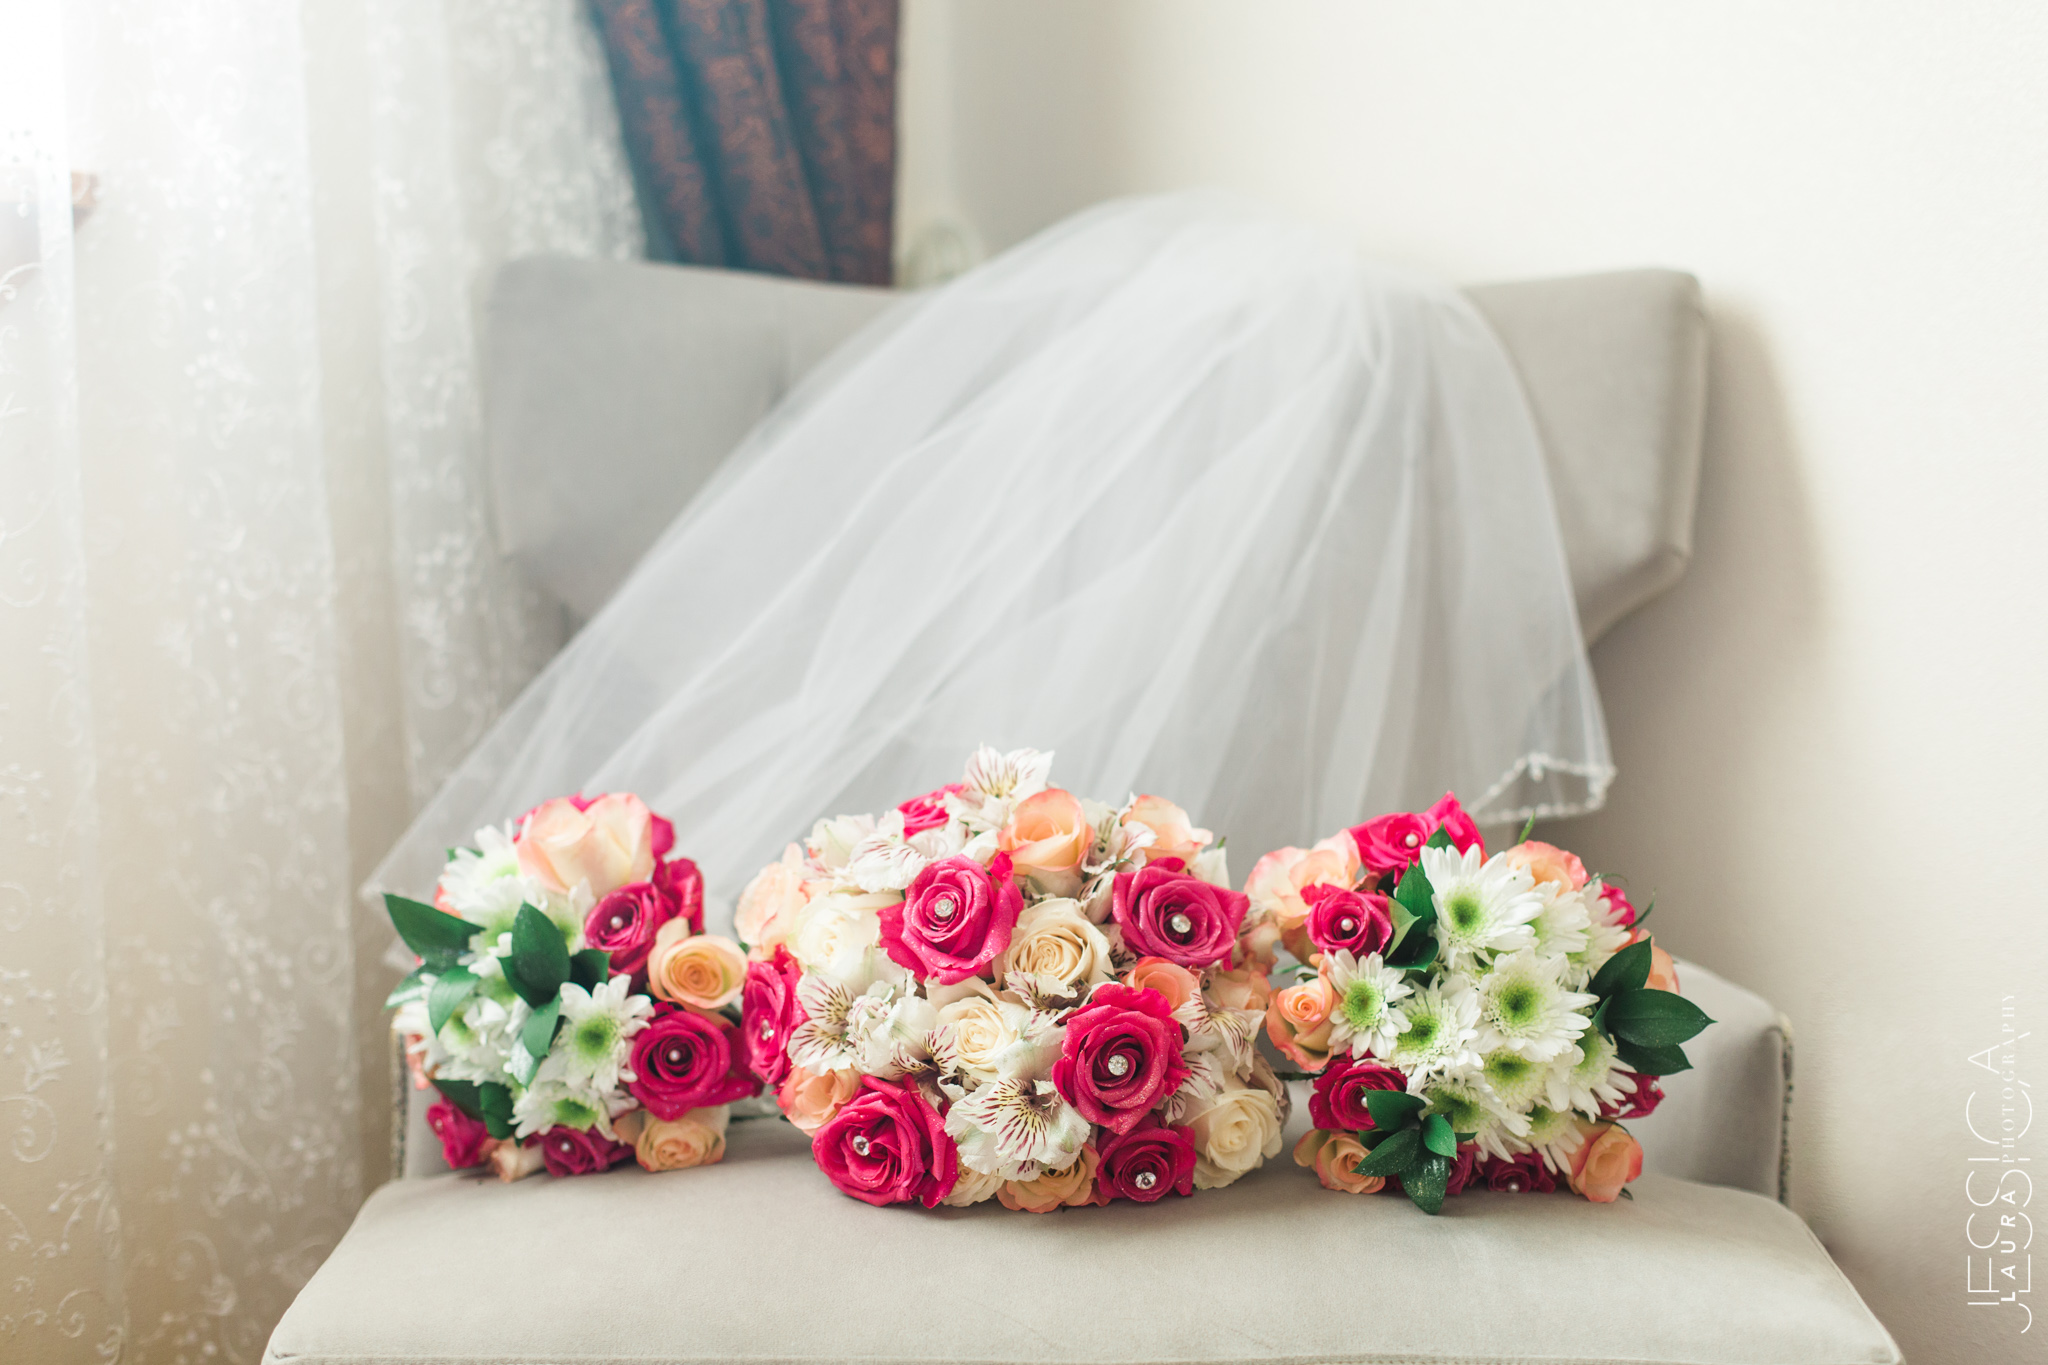 Eugene-Maryana_wedding_08062017_web (5 of 558).JPG